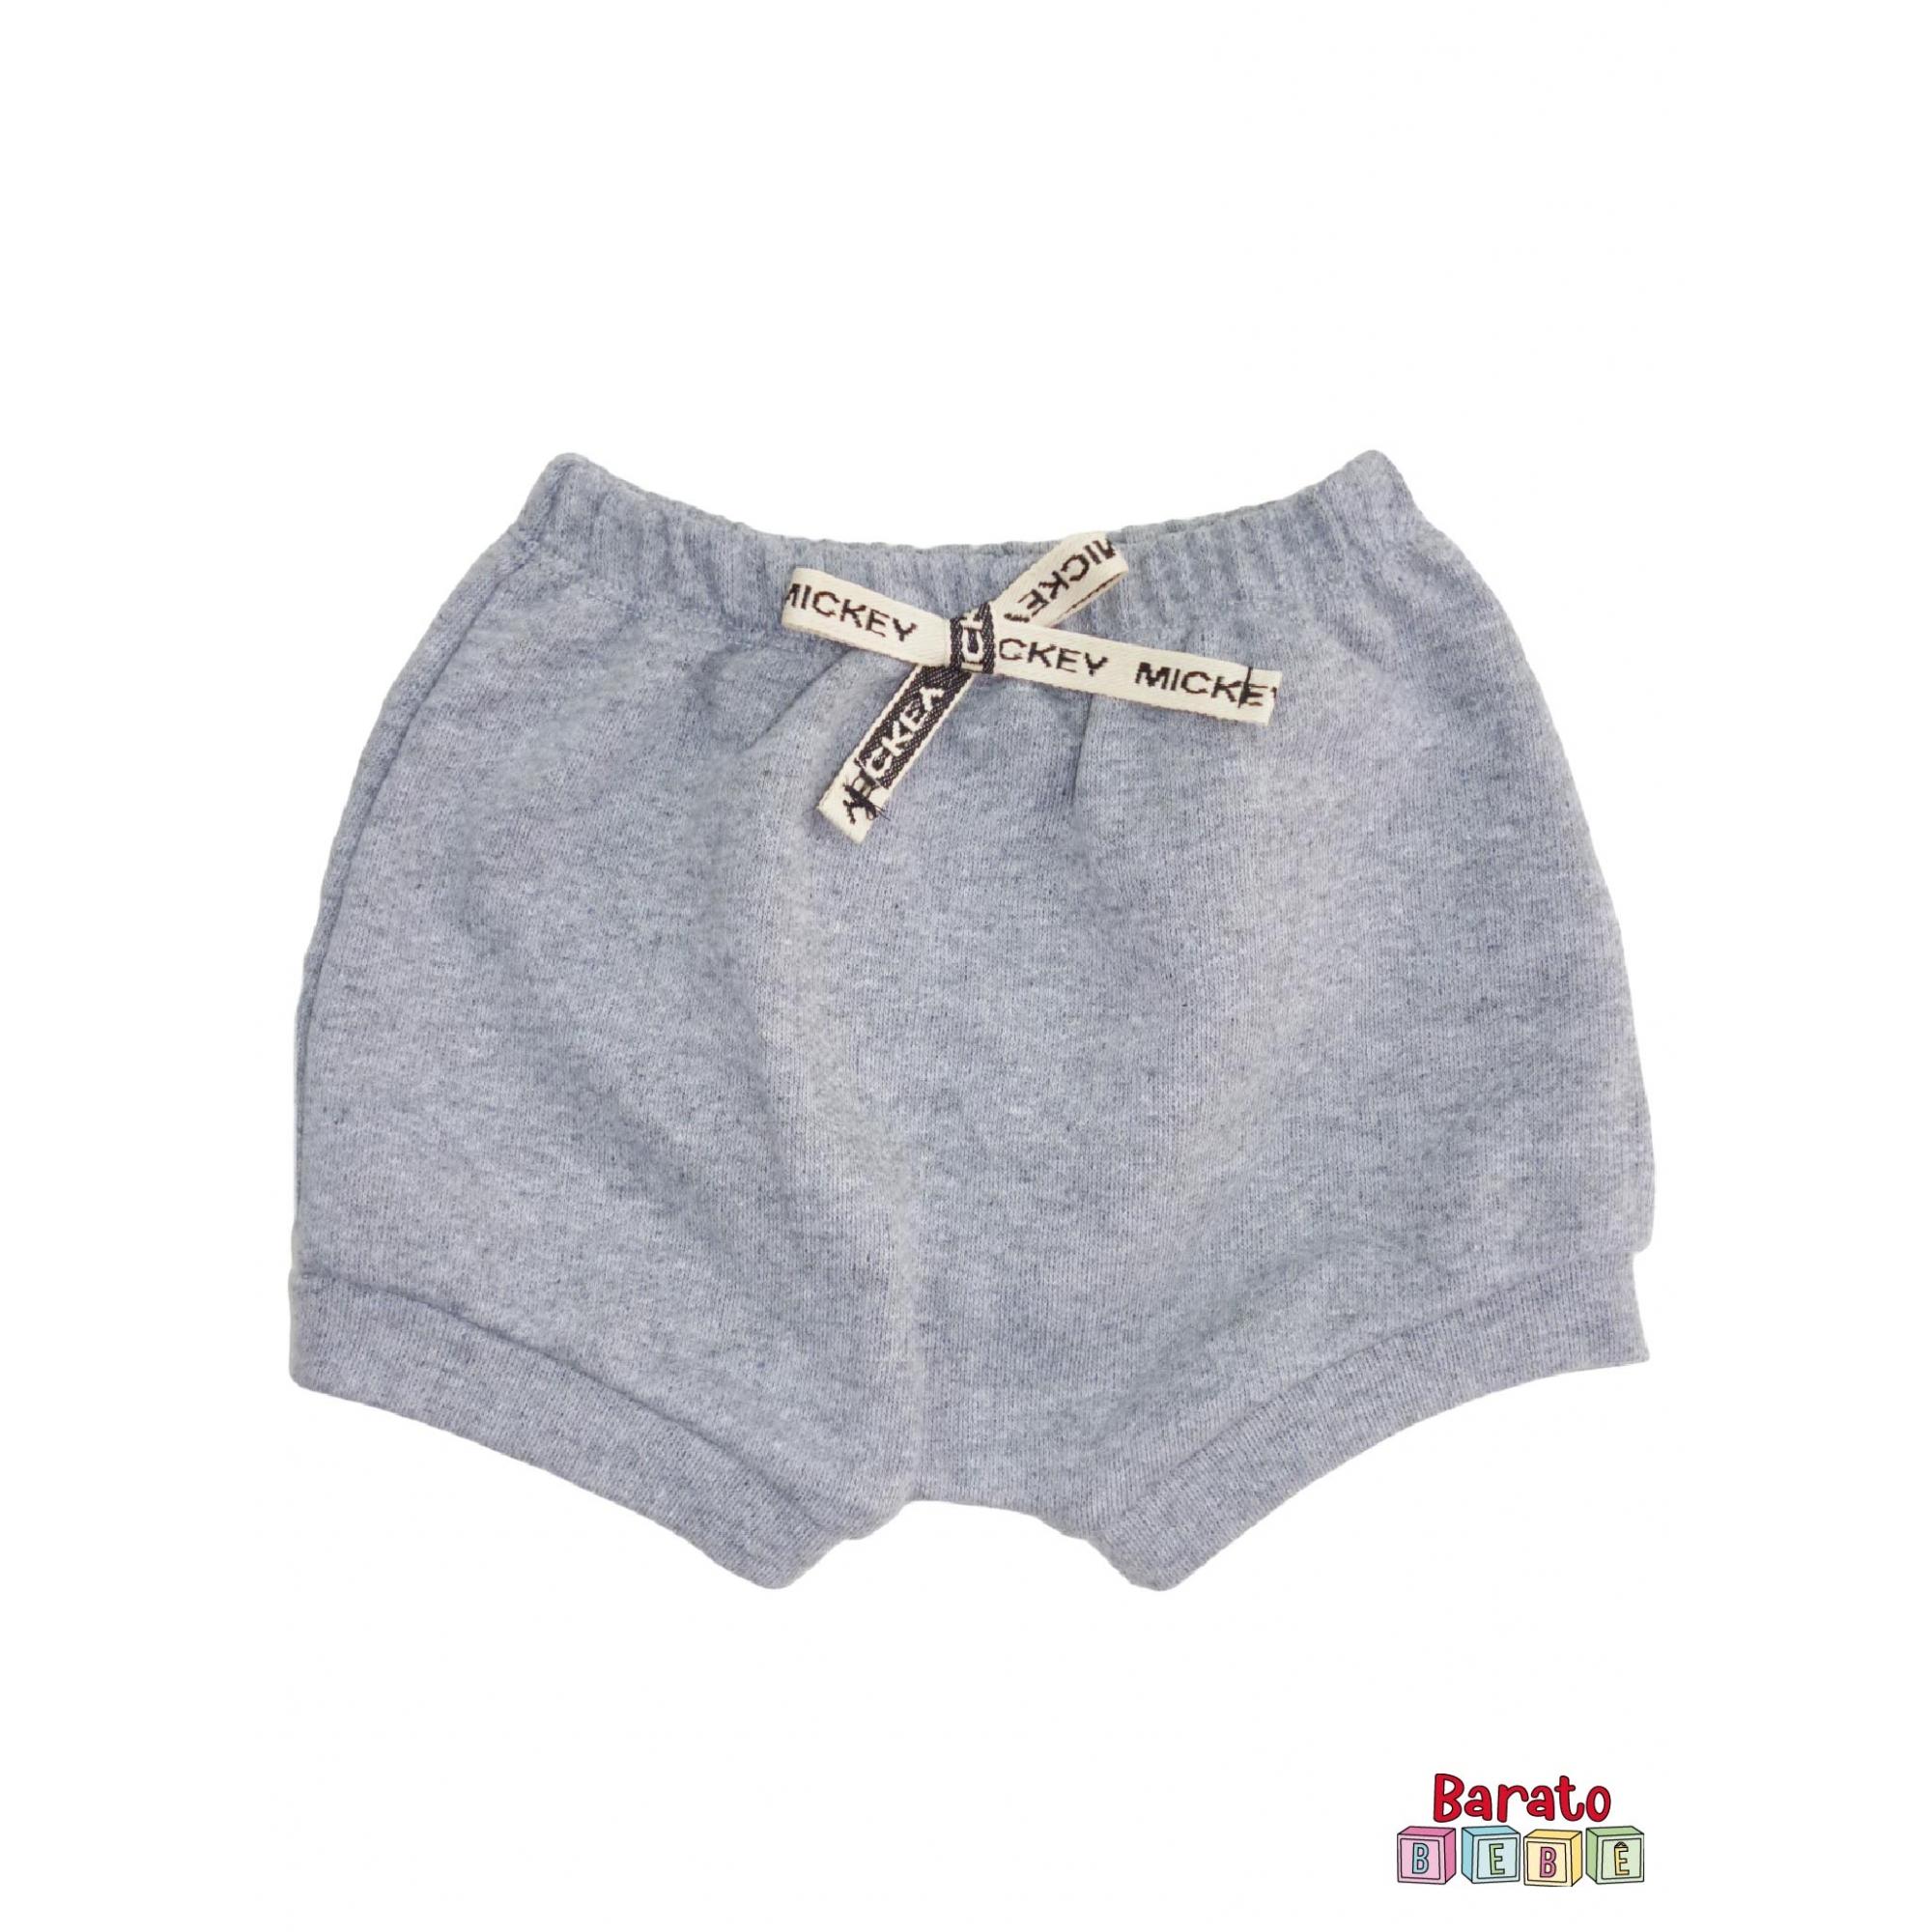 Shorts(Tapa Fralda) Bebê(P/M/G)  - Barato Bebê - Mescla C/ Laço Tematico